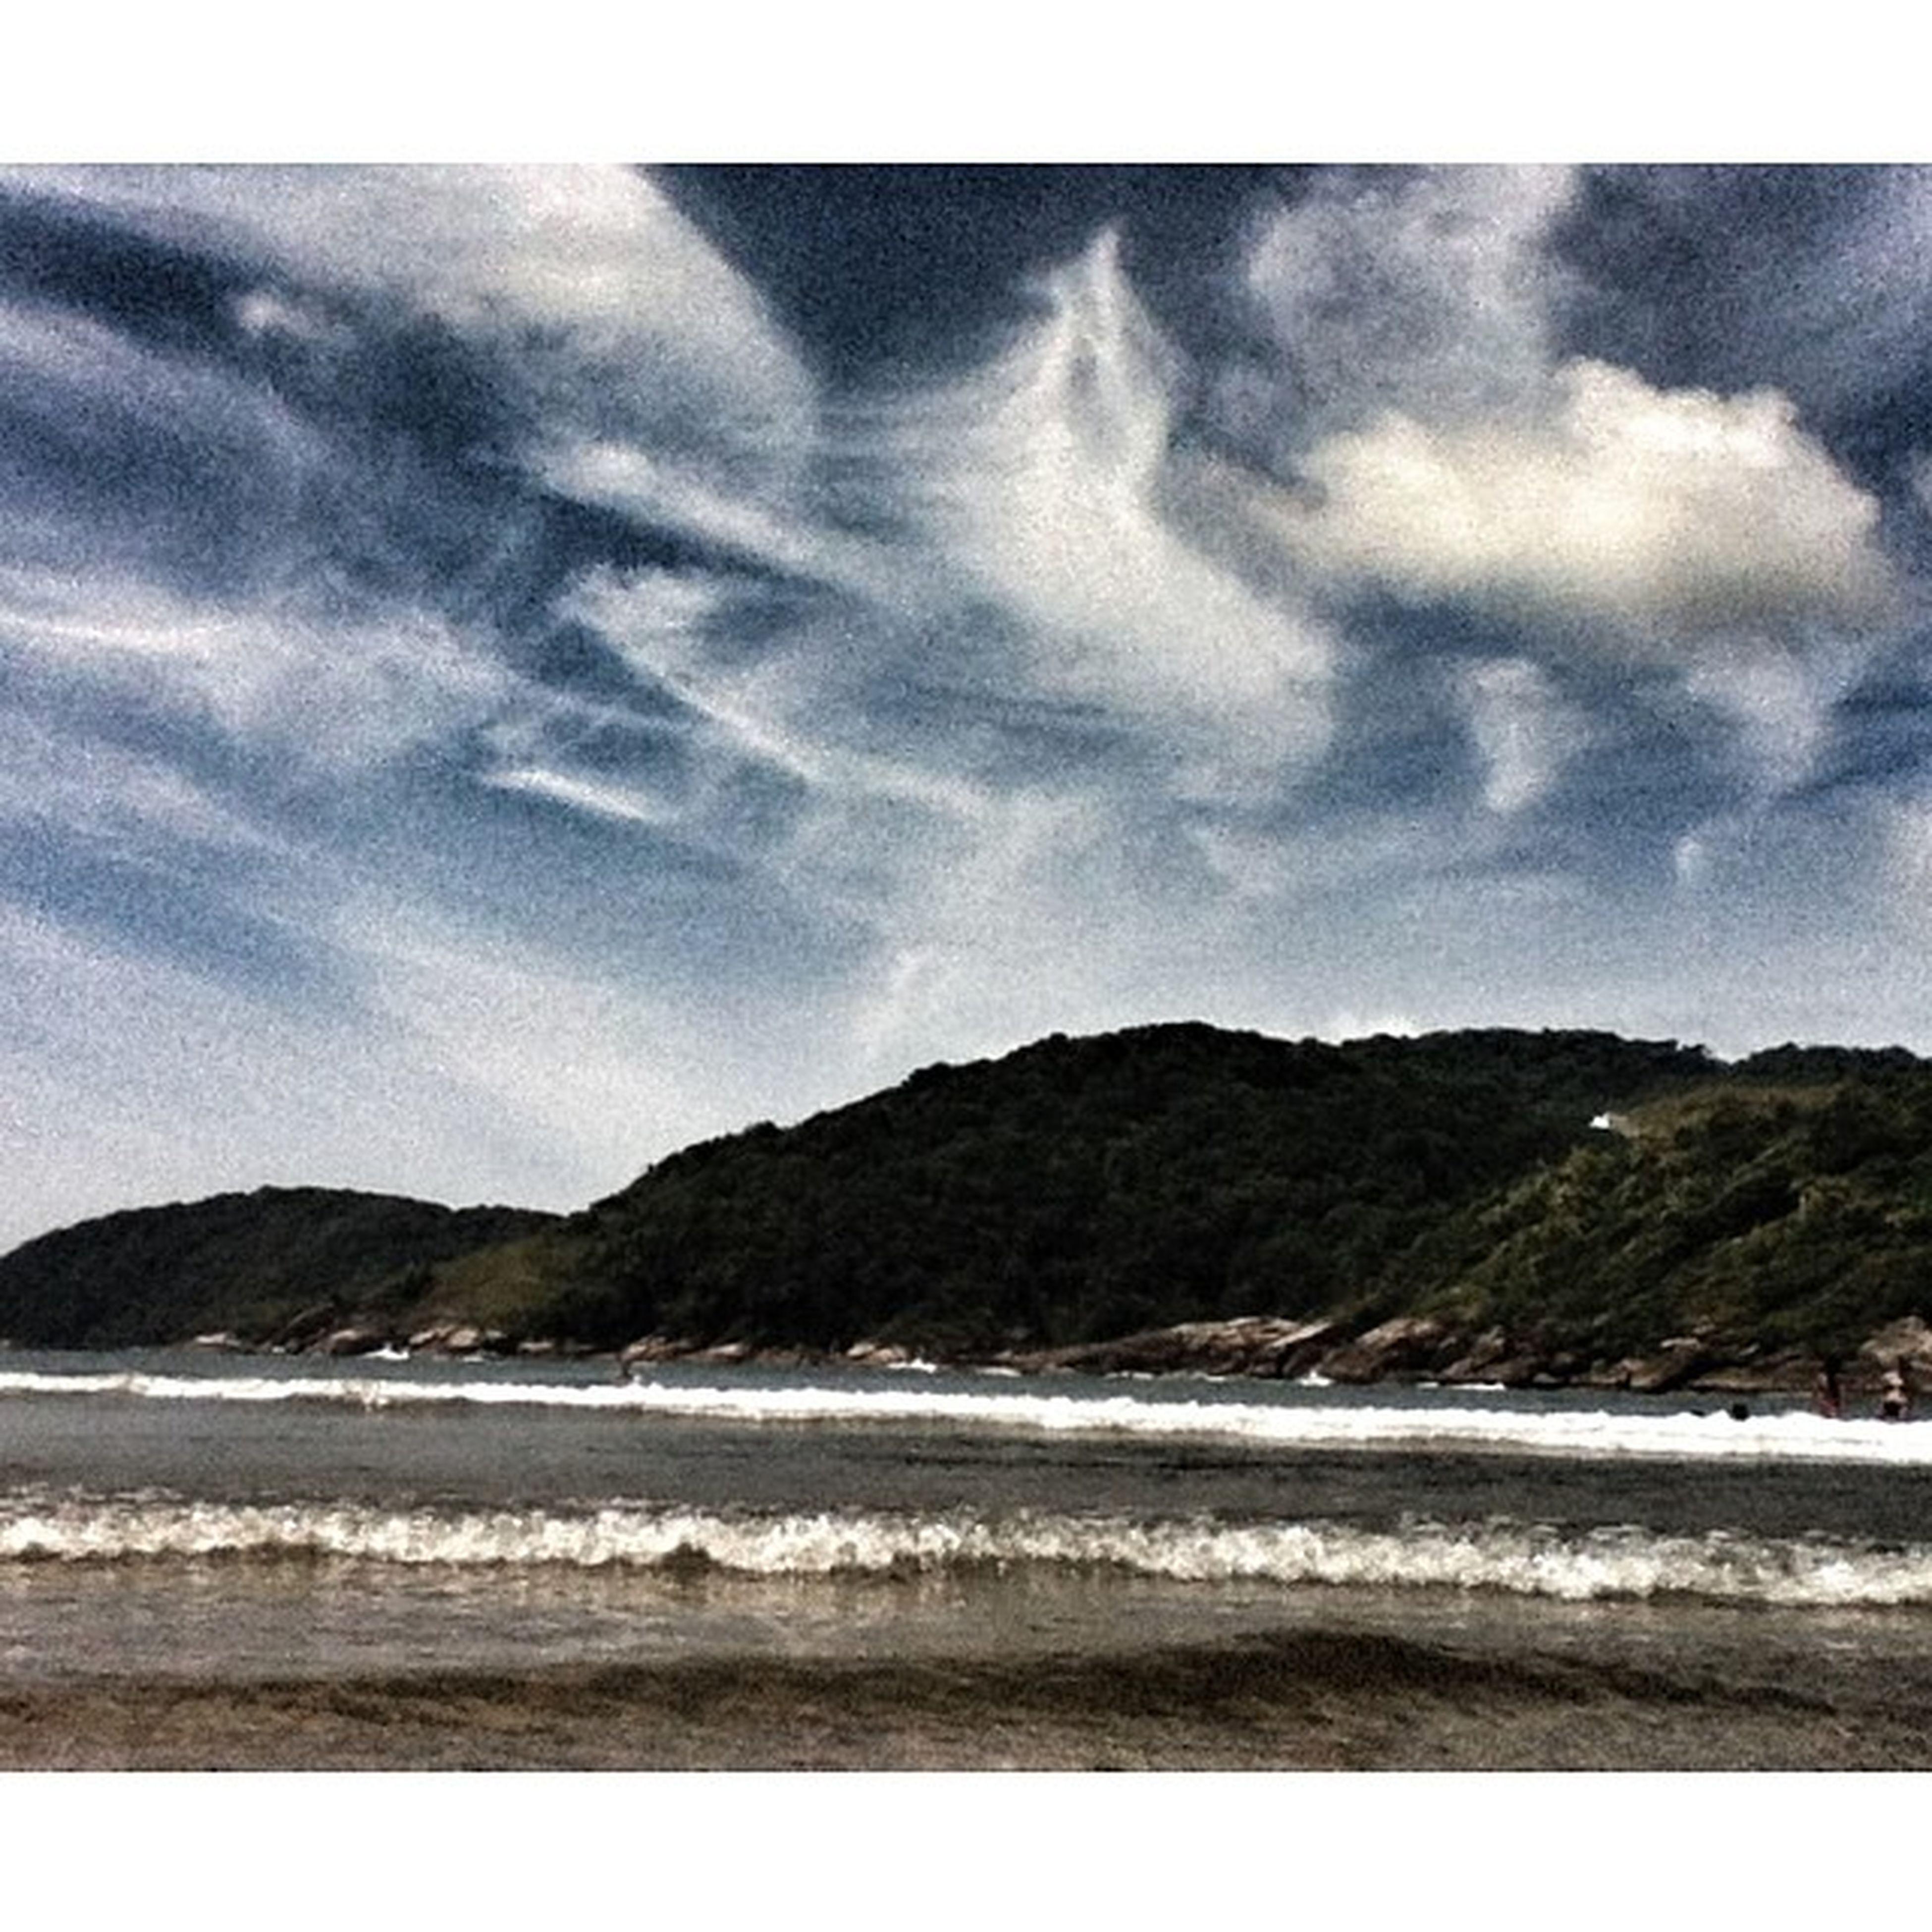 water, mountain, sky, tranquil scene, scenics, tranquility, beauty in nature, sea, cloud - sky, mountain range, beach, nature, cloudy, cloud, shore, idyllic, coastline, lake, outdoors, non-urban scene